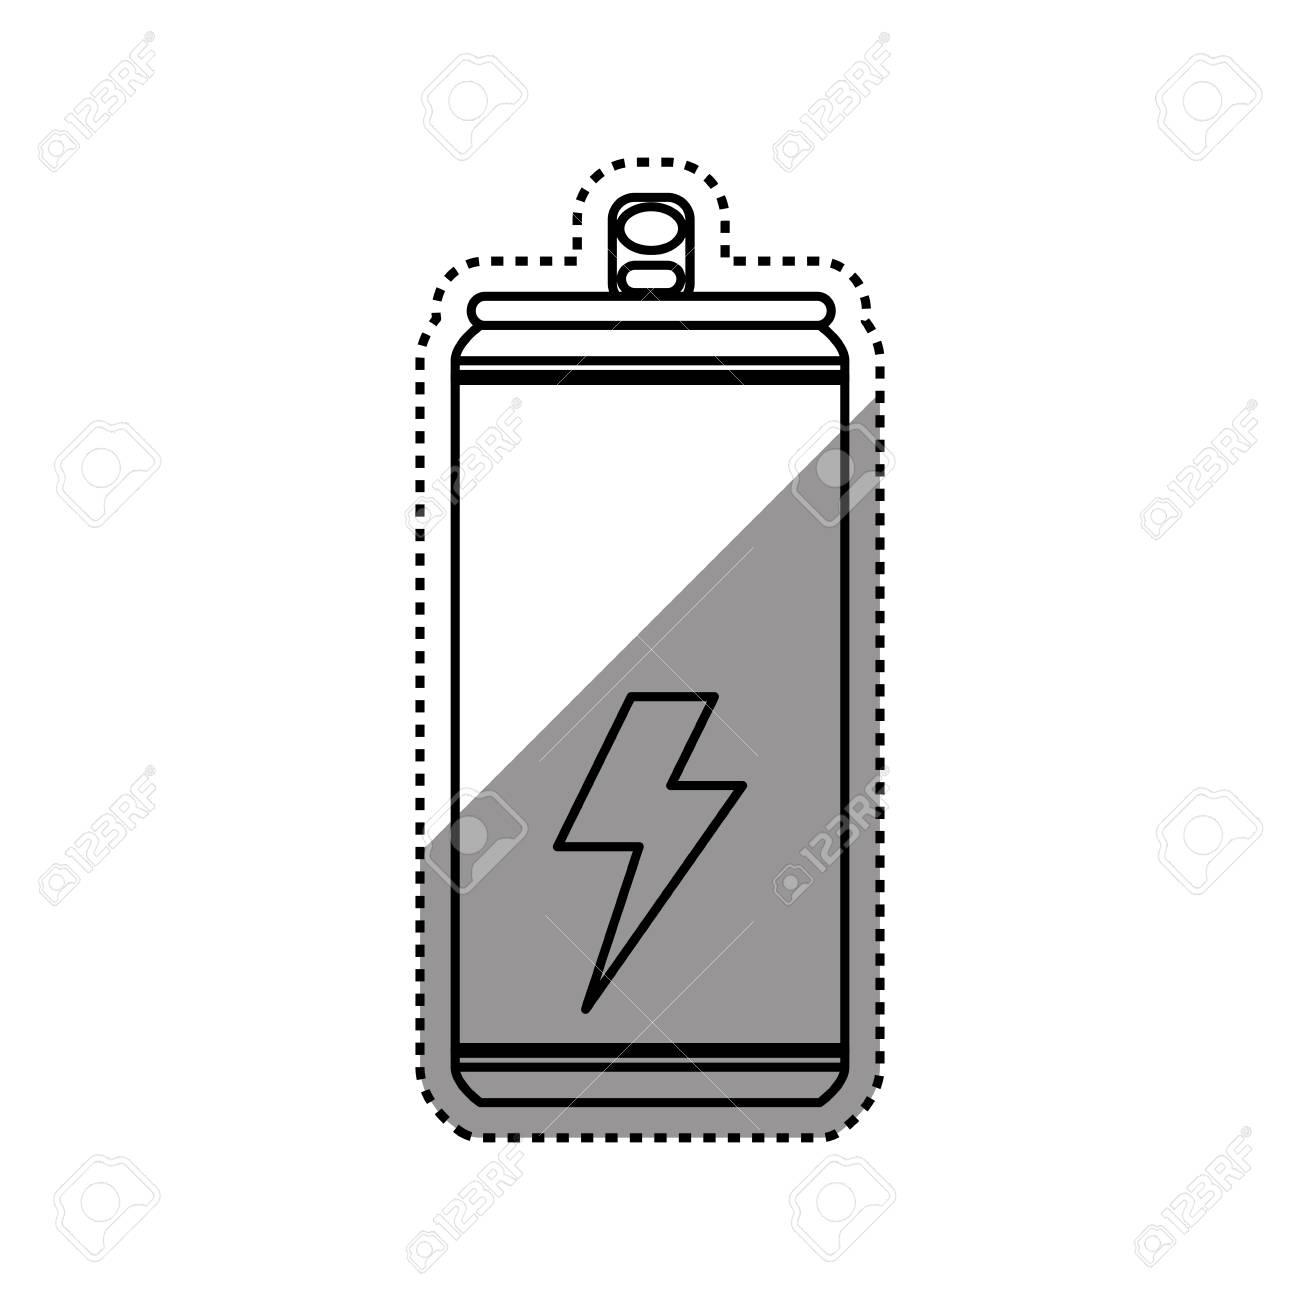 Fancy Battery Notation Sketch - Wiring Diagram Ideas - guapodugh.com